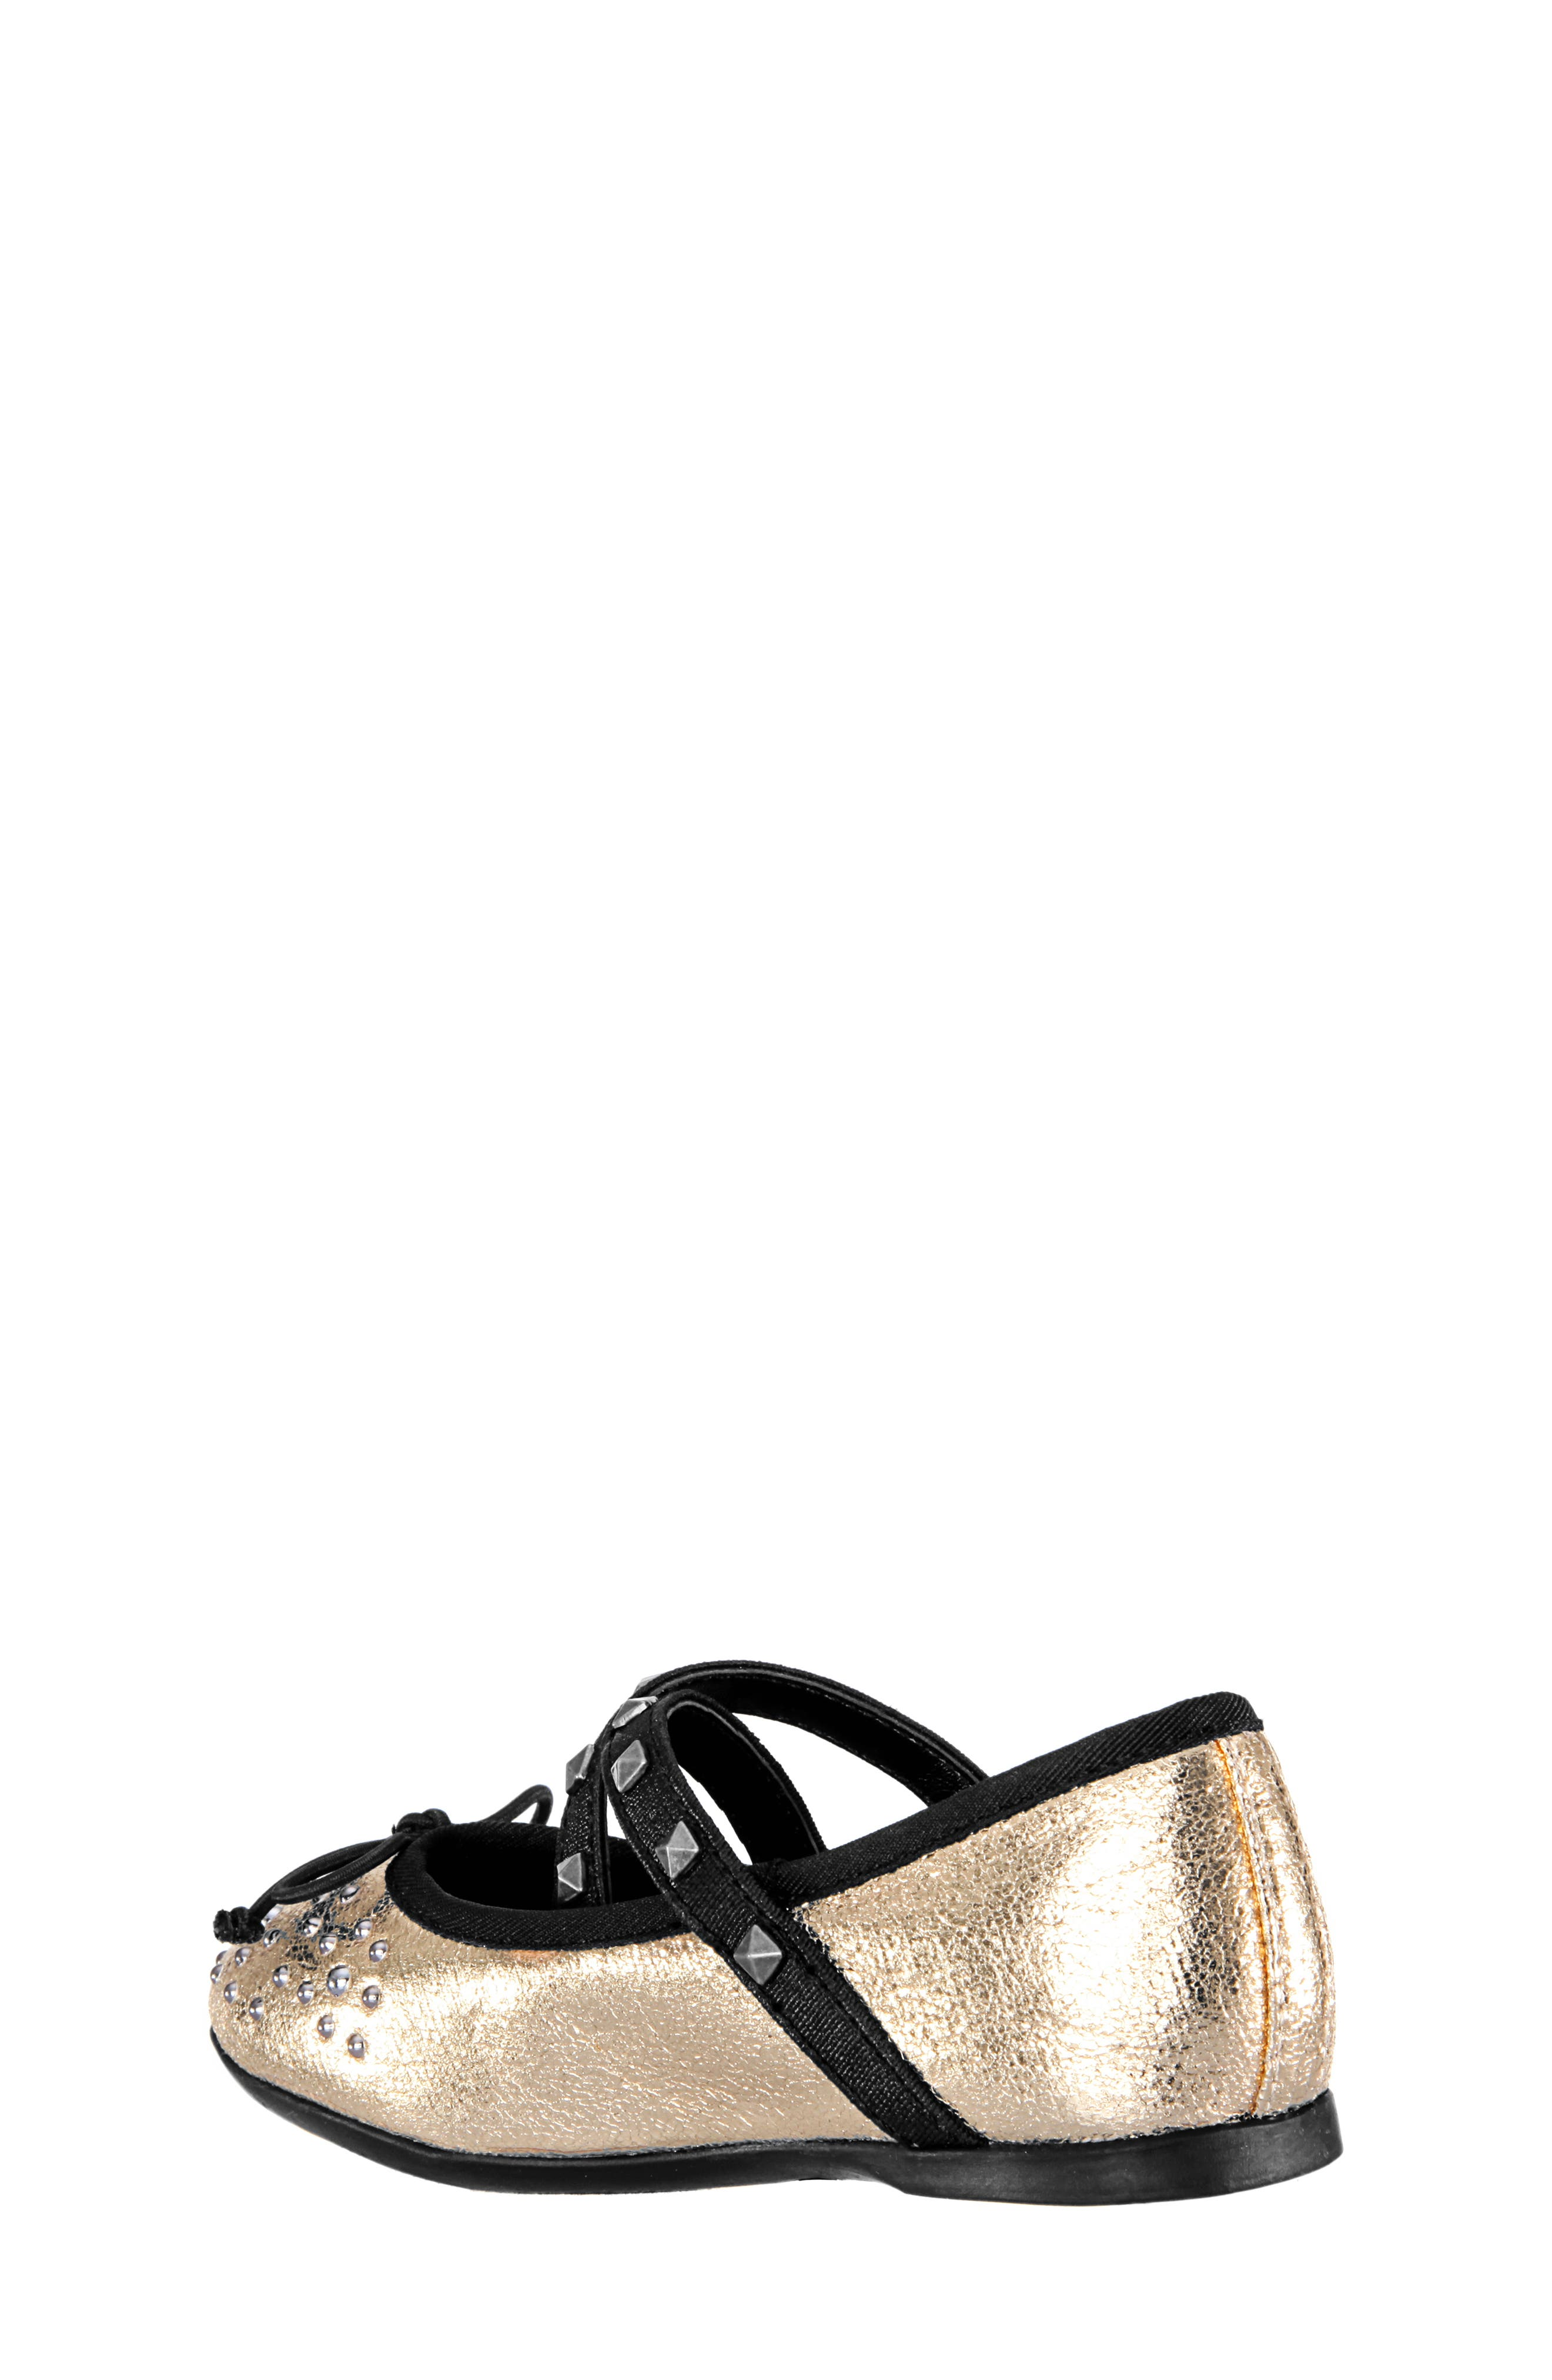 Averi Studded Ballet Flat,                             Alternate thumbnail 2, color,                             GOLD CRACKLE METALLIC